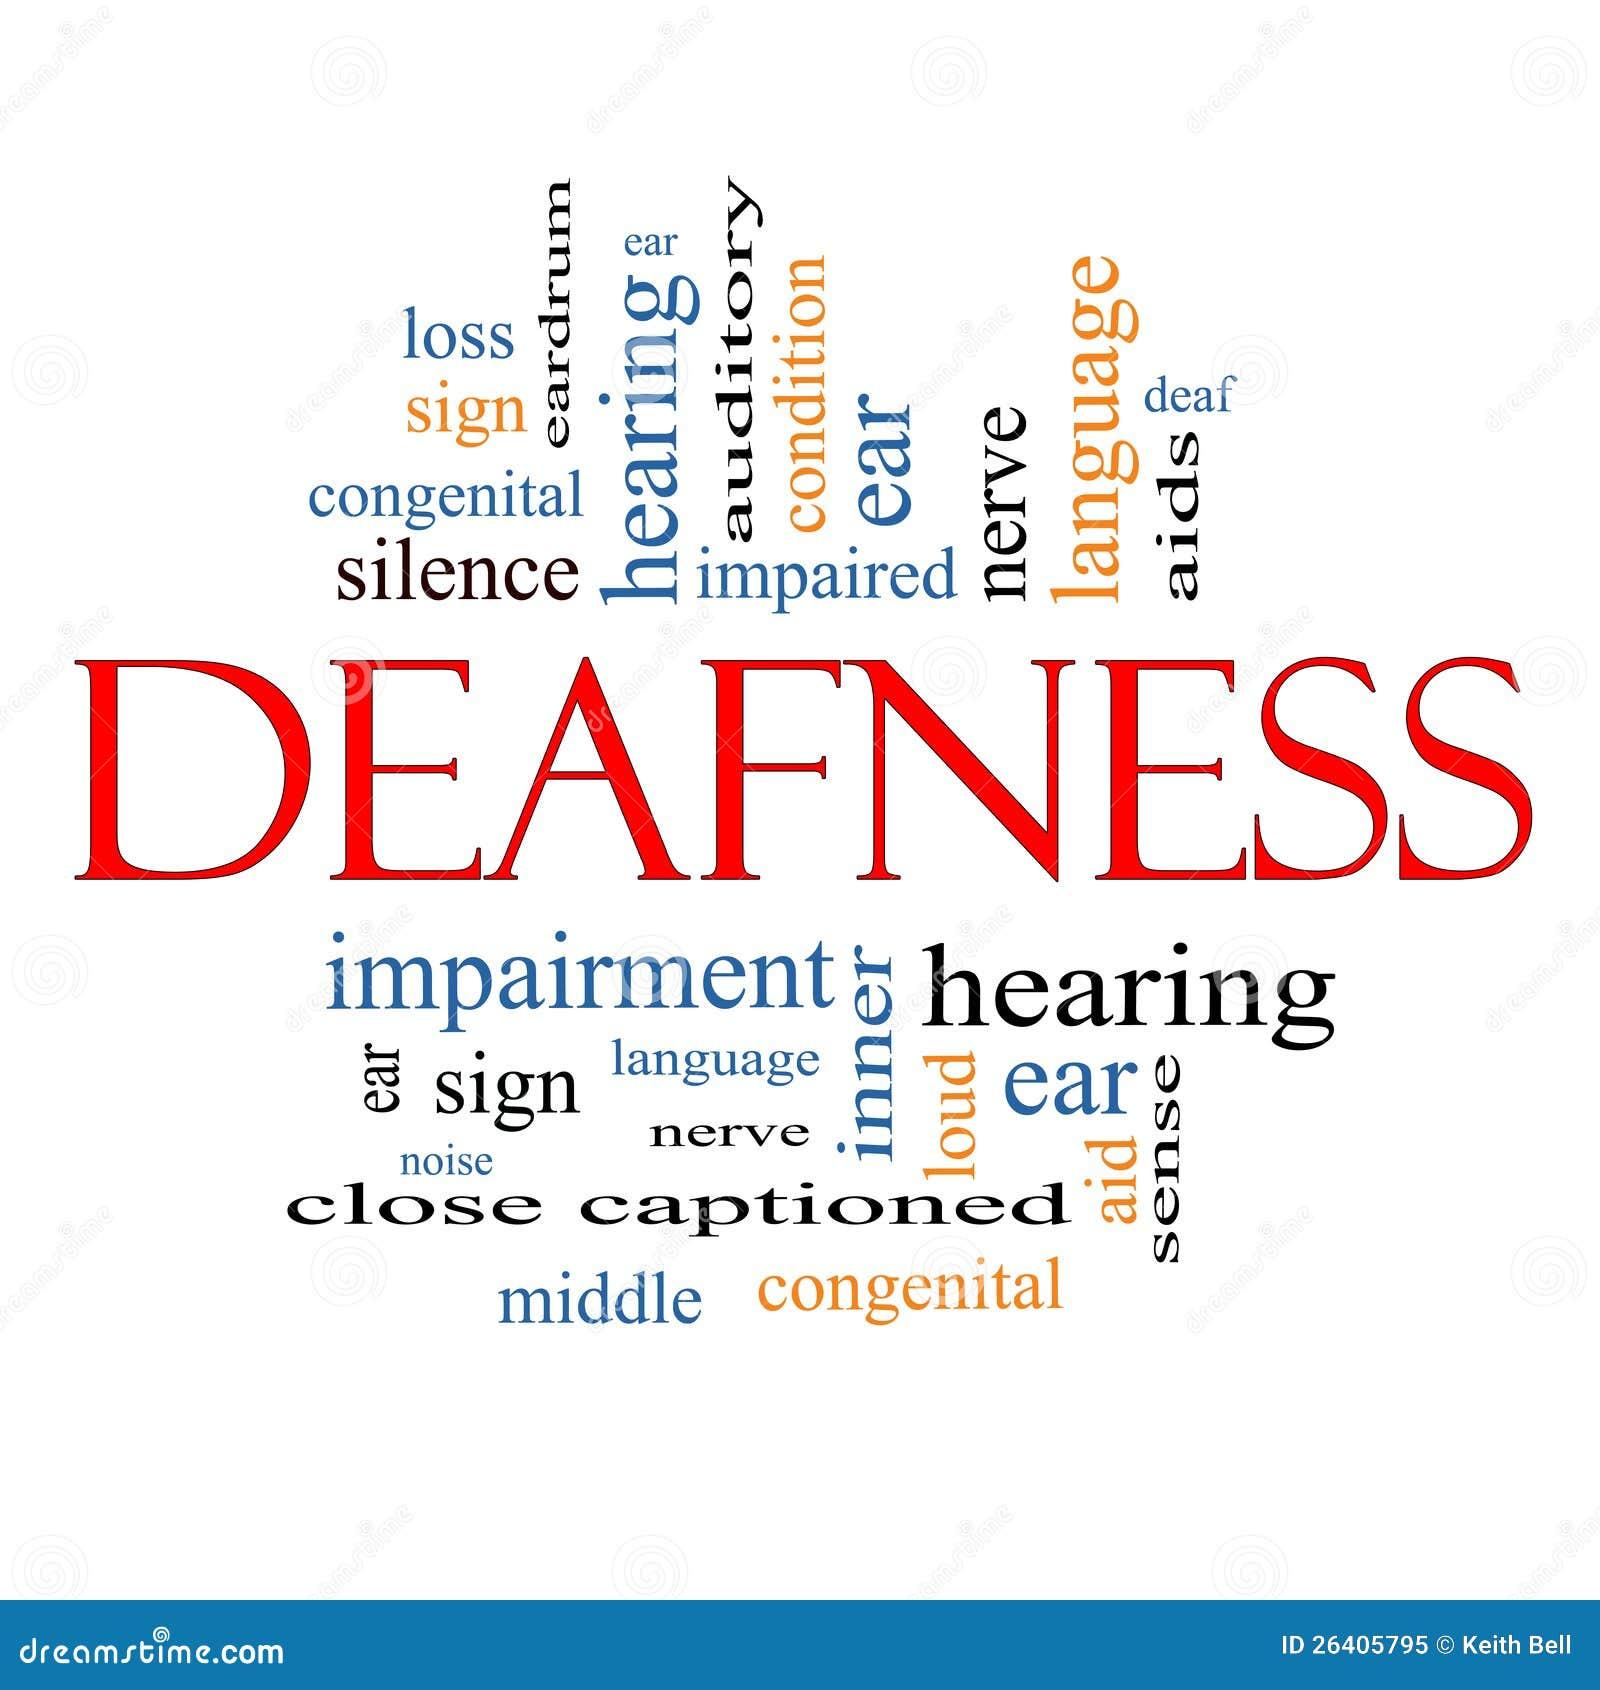 deafness word cloud concept stock illustration ear clipart cl ear background ear clipart cl ear background